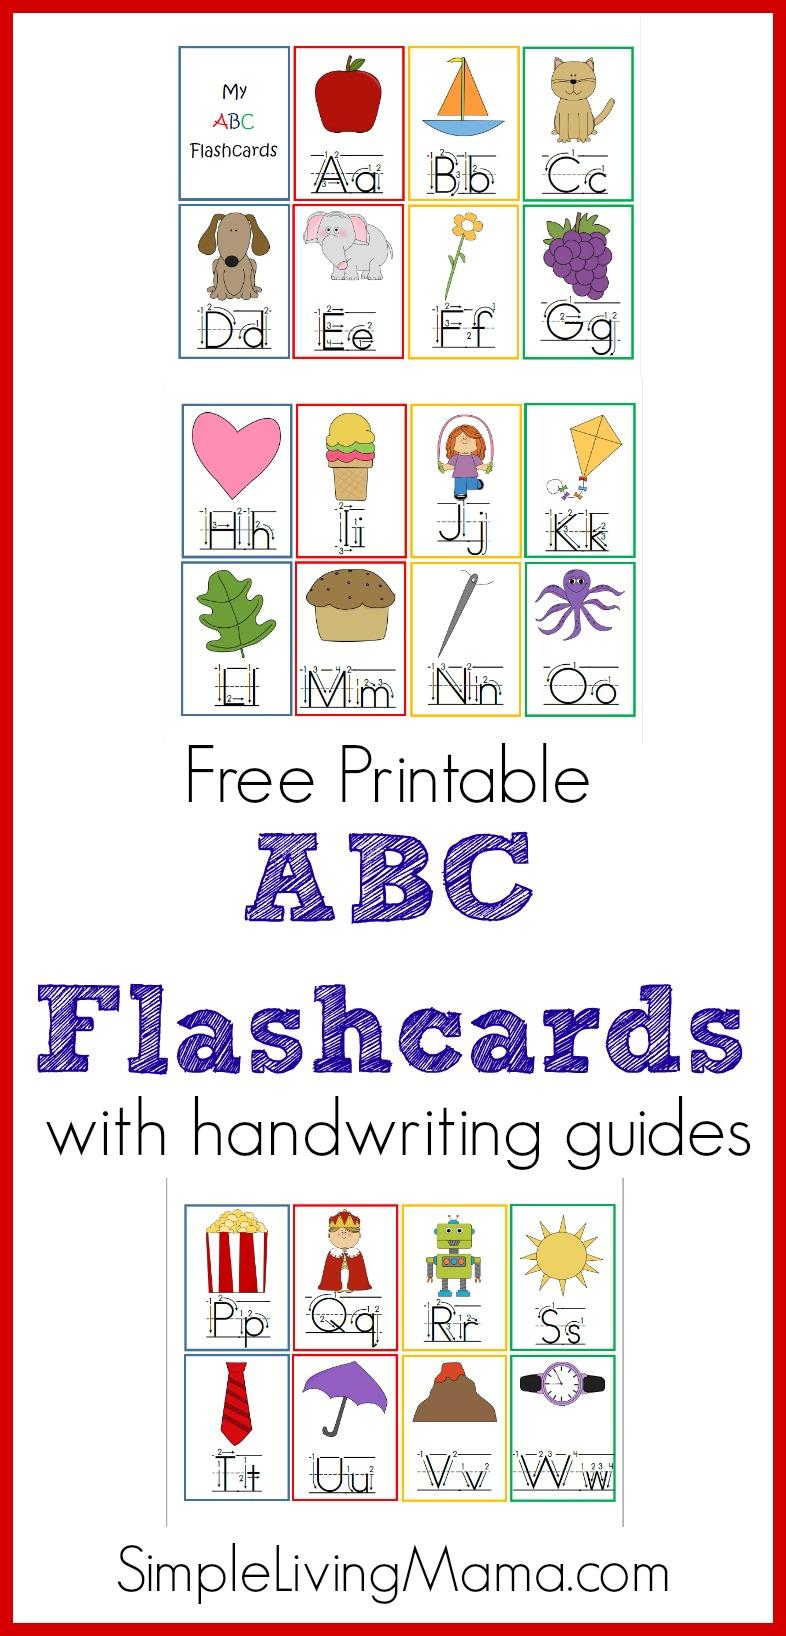 Printable Abc Flashcards - Homeschool Printables For Free - Free Printable Abc Flashcards With Pictures